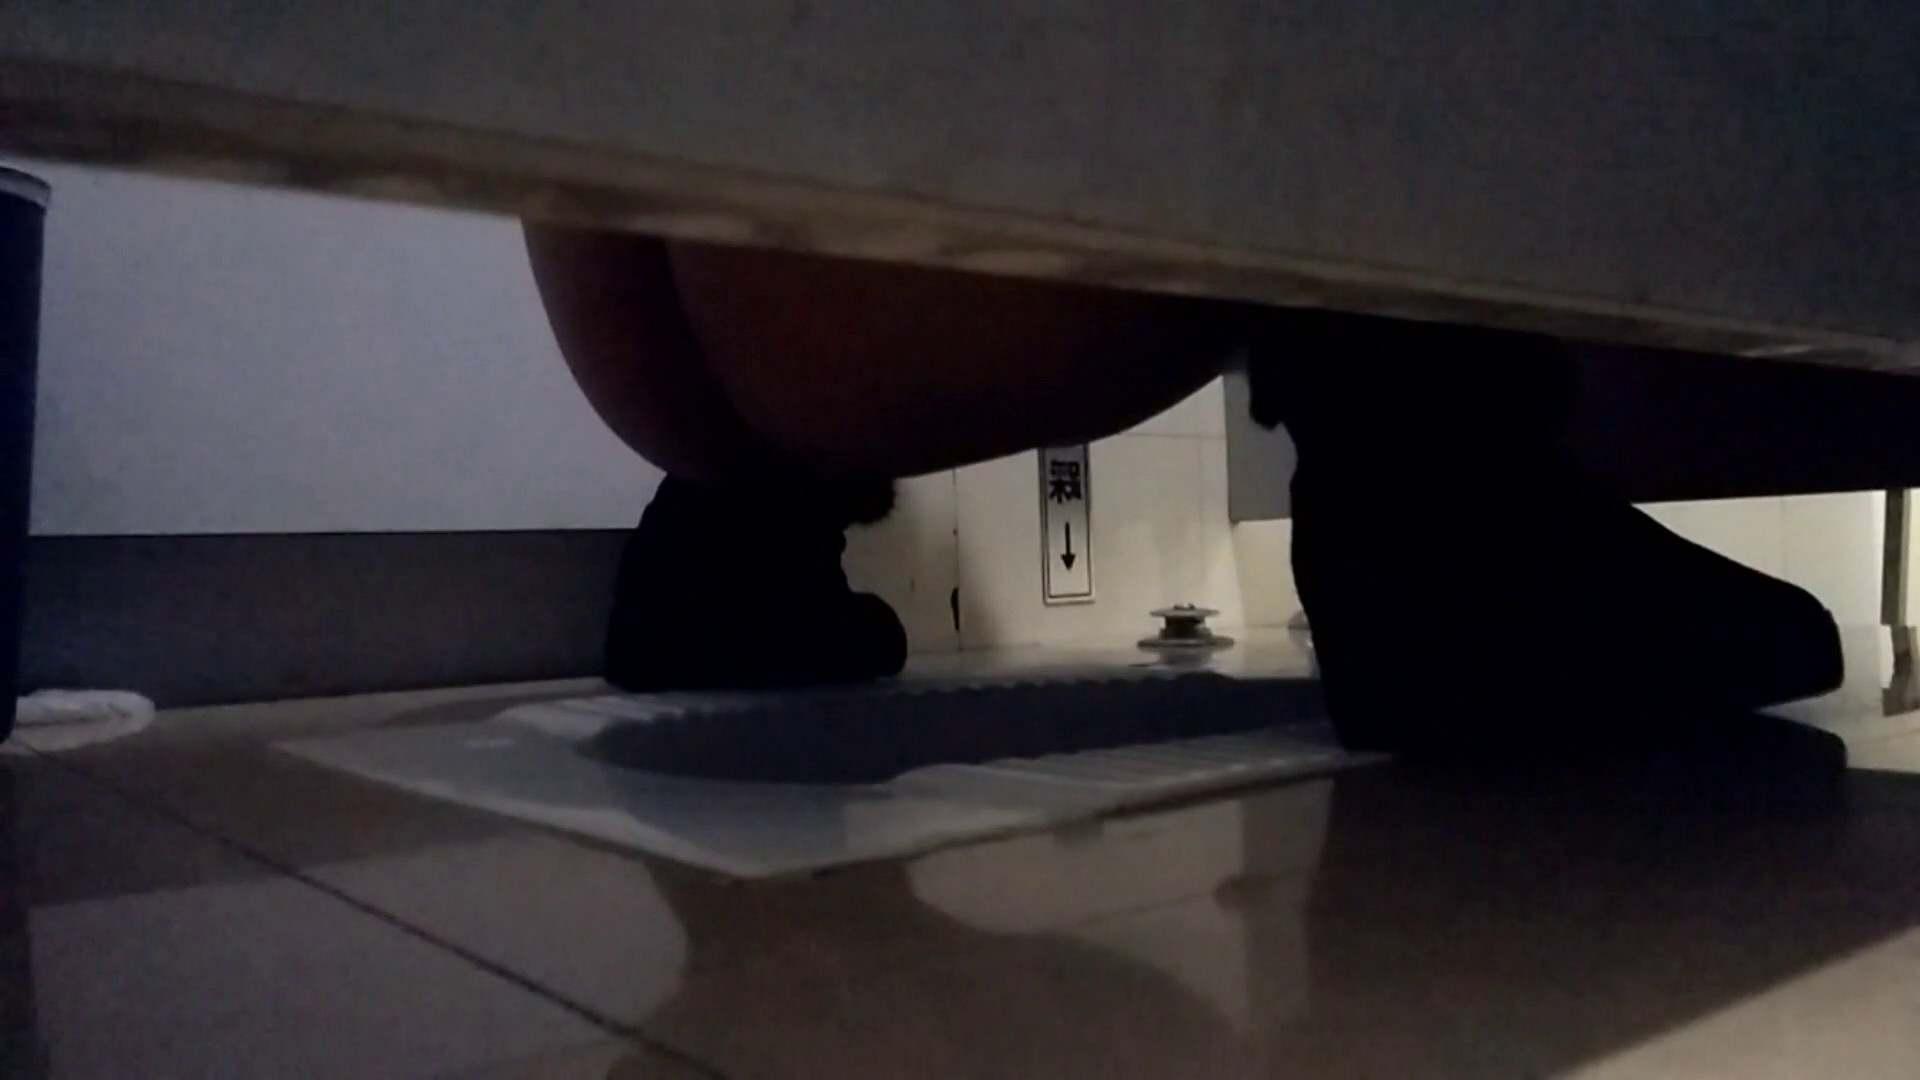 芸術大学ガチ潜入盗撮 JD盗撮 美女の洗面所の秘密 Vol.99 美女 ヌード画像 65画像 52